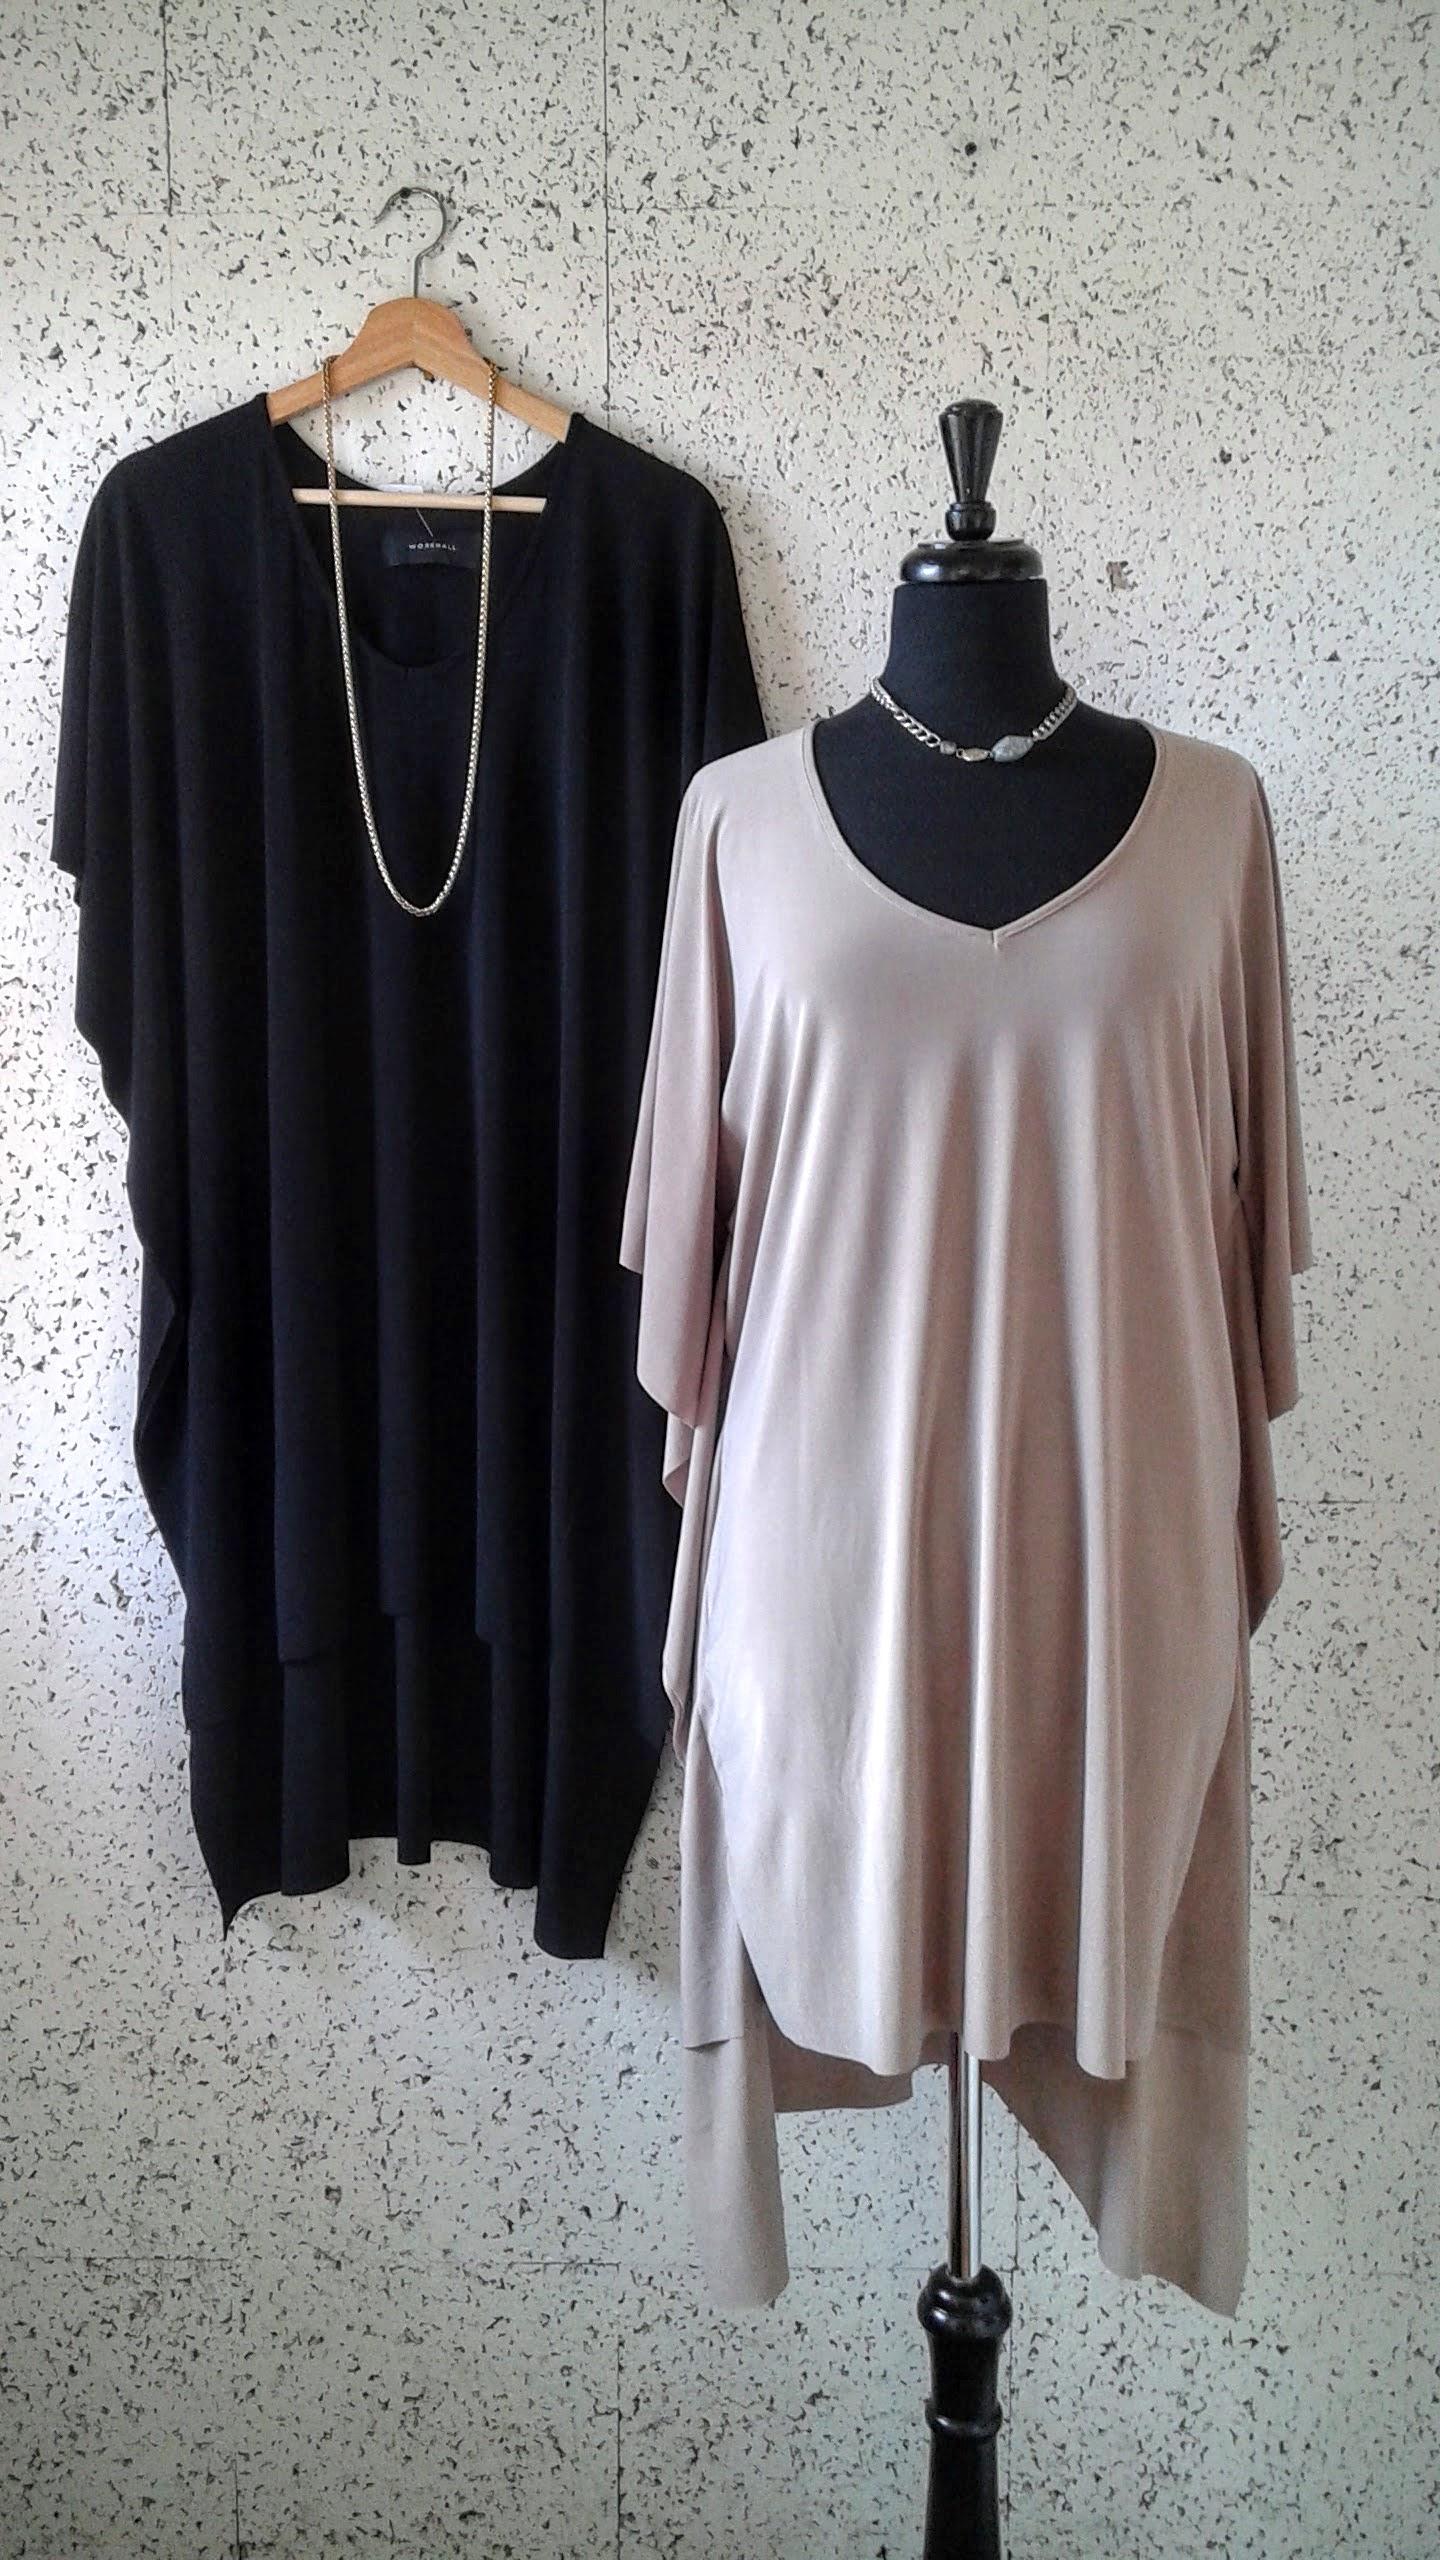 Workhall dresses; Size M, $52 each